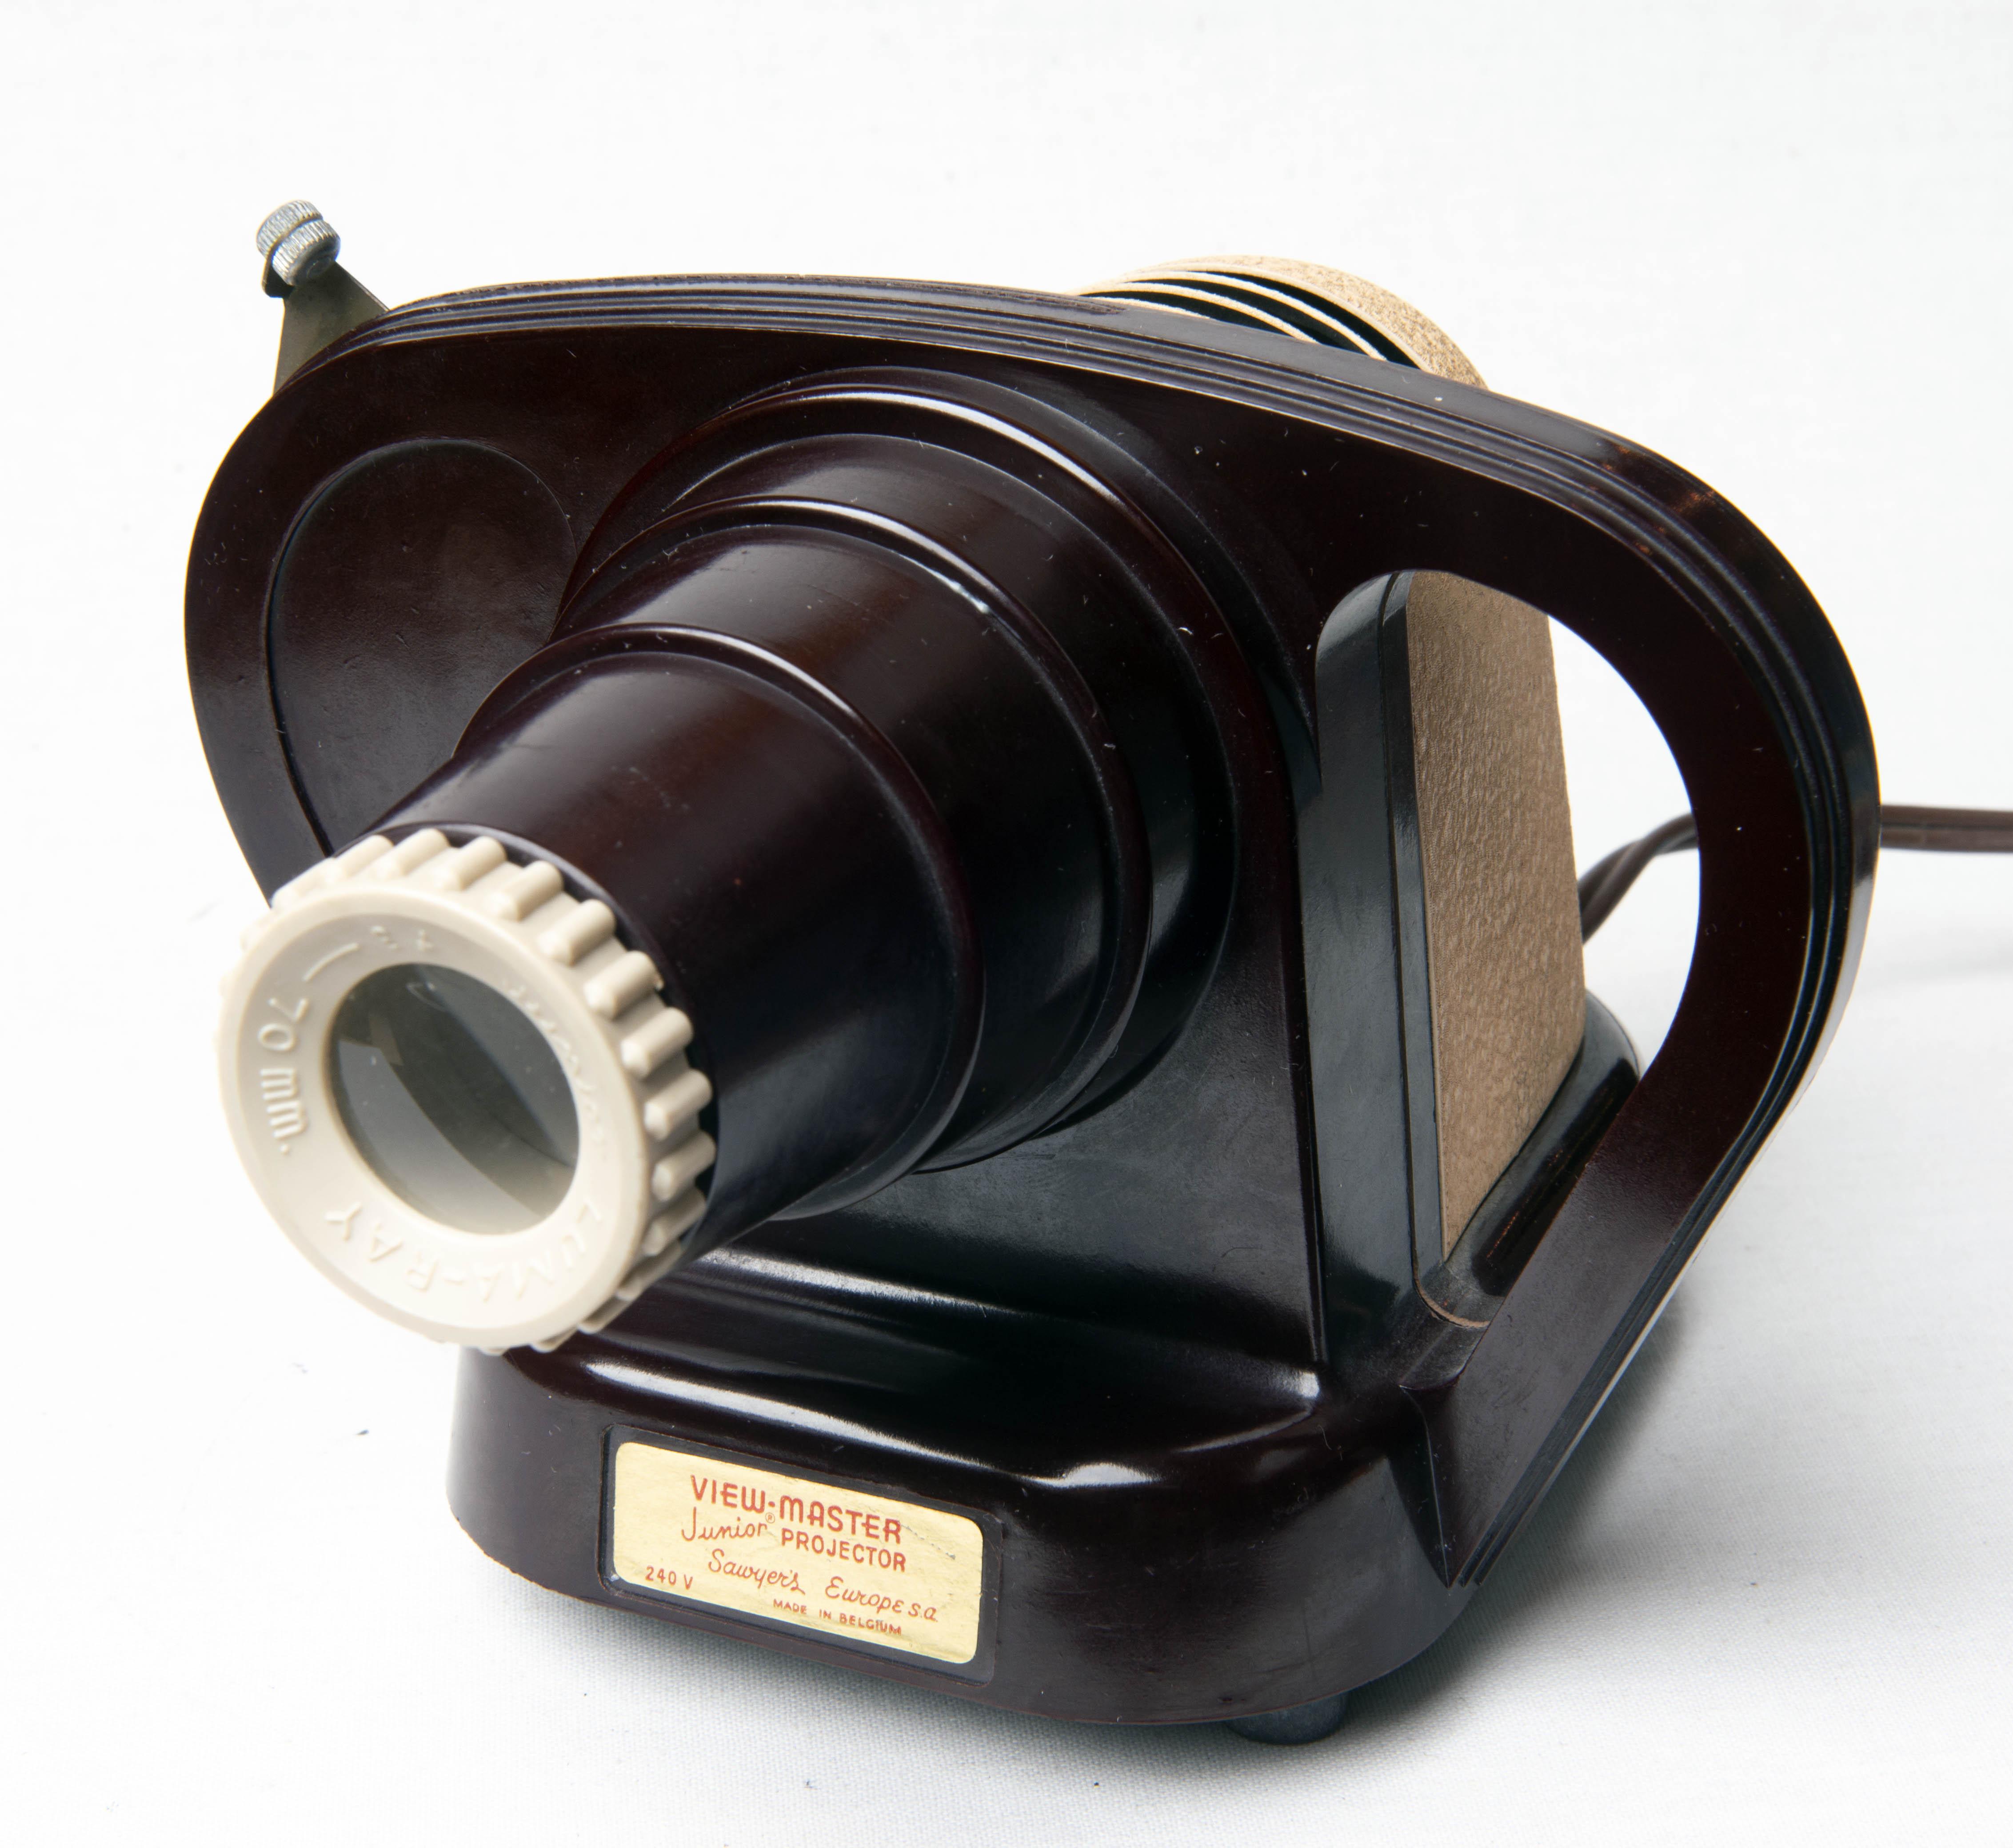 View Master Junior Projector